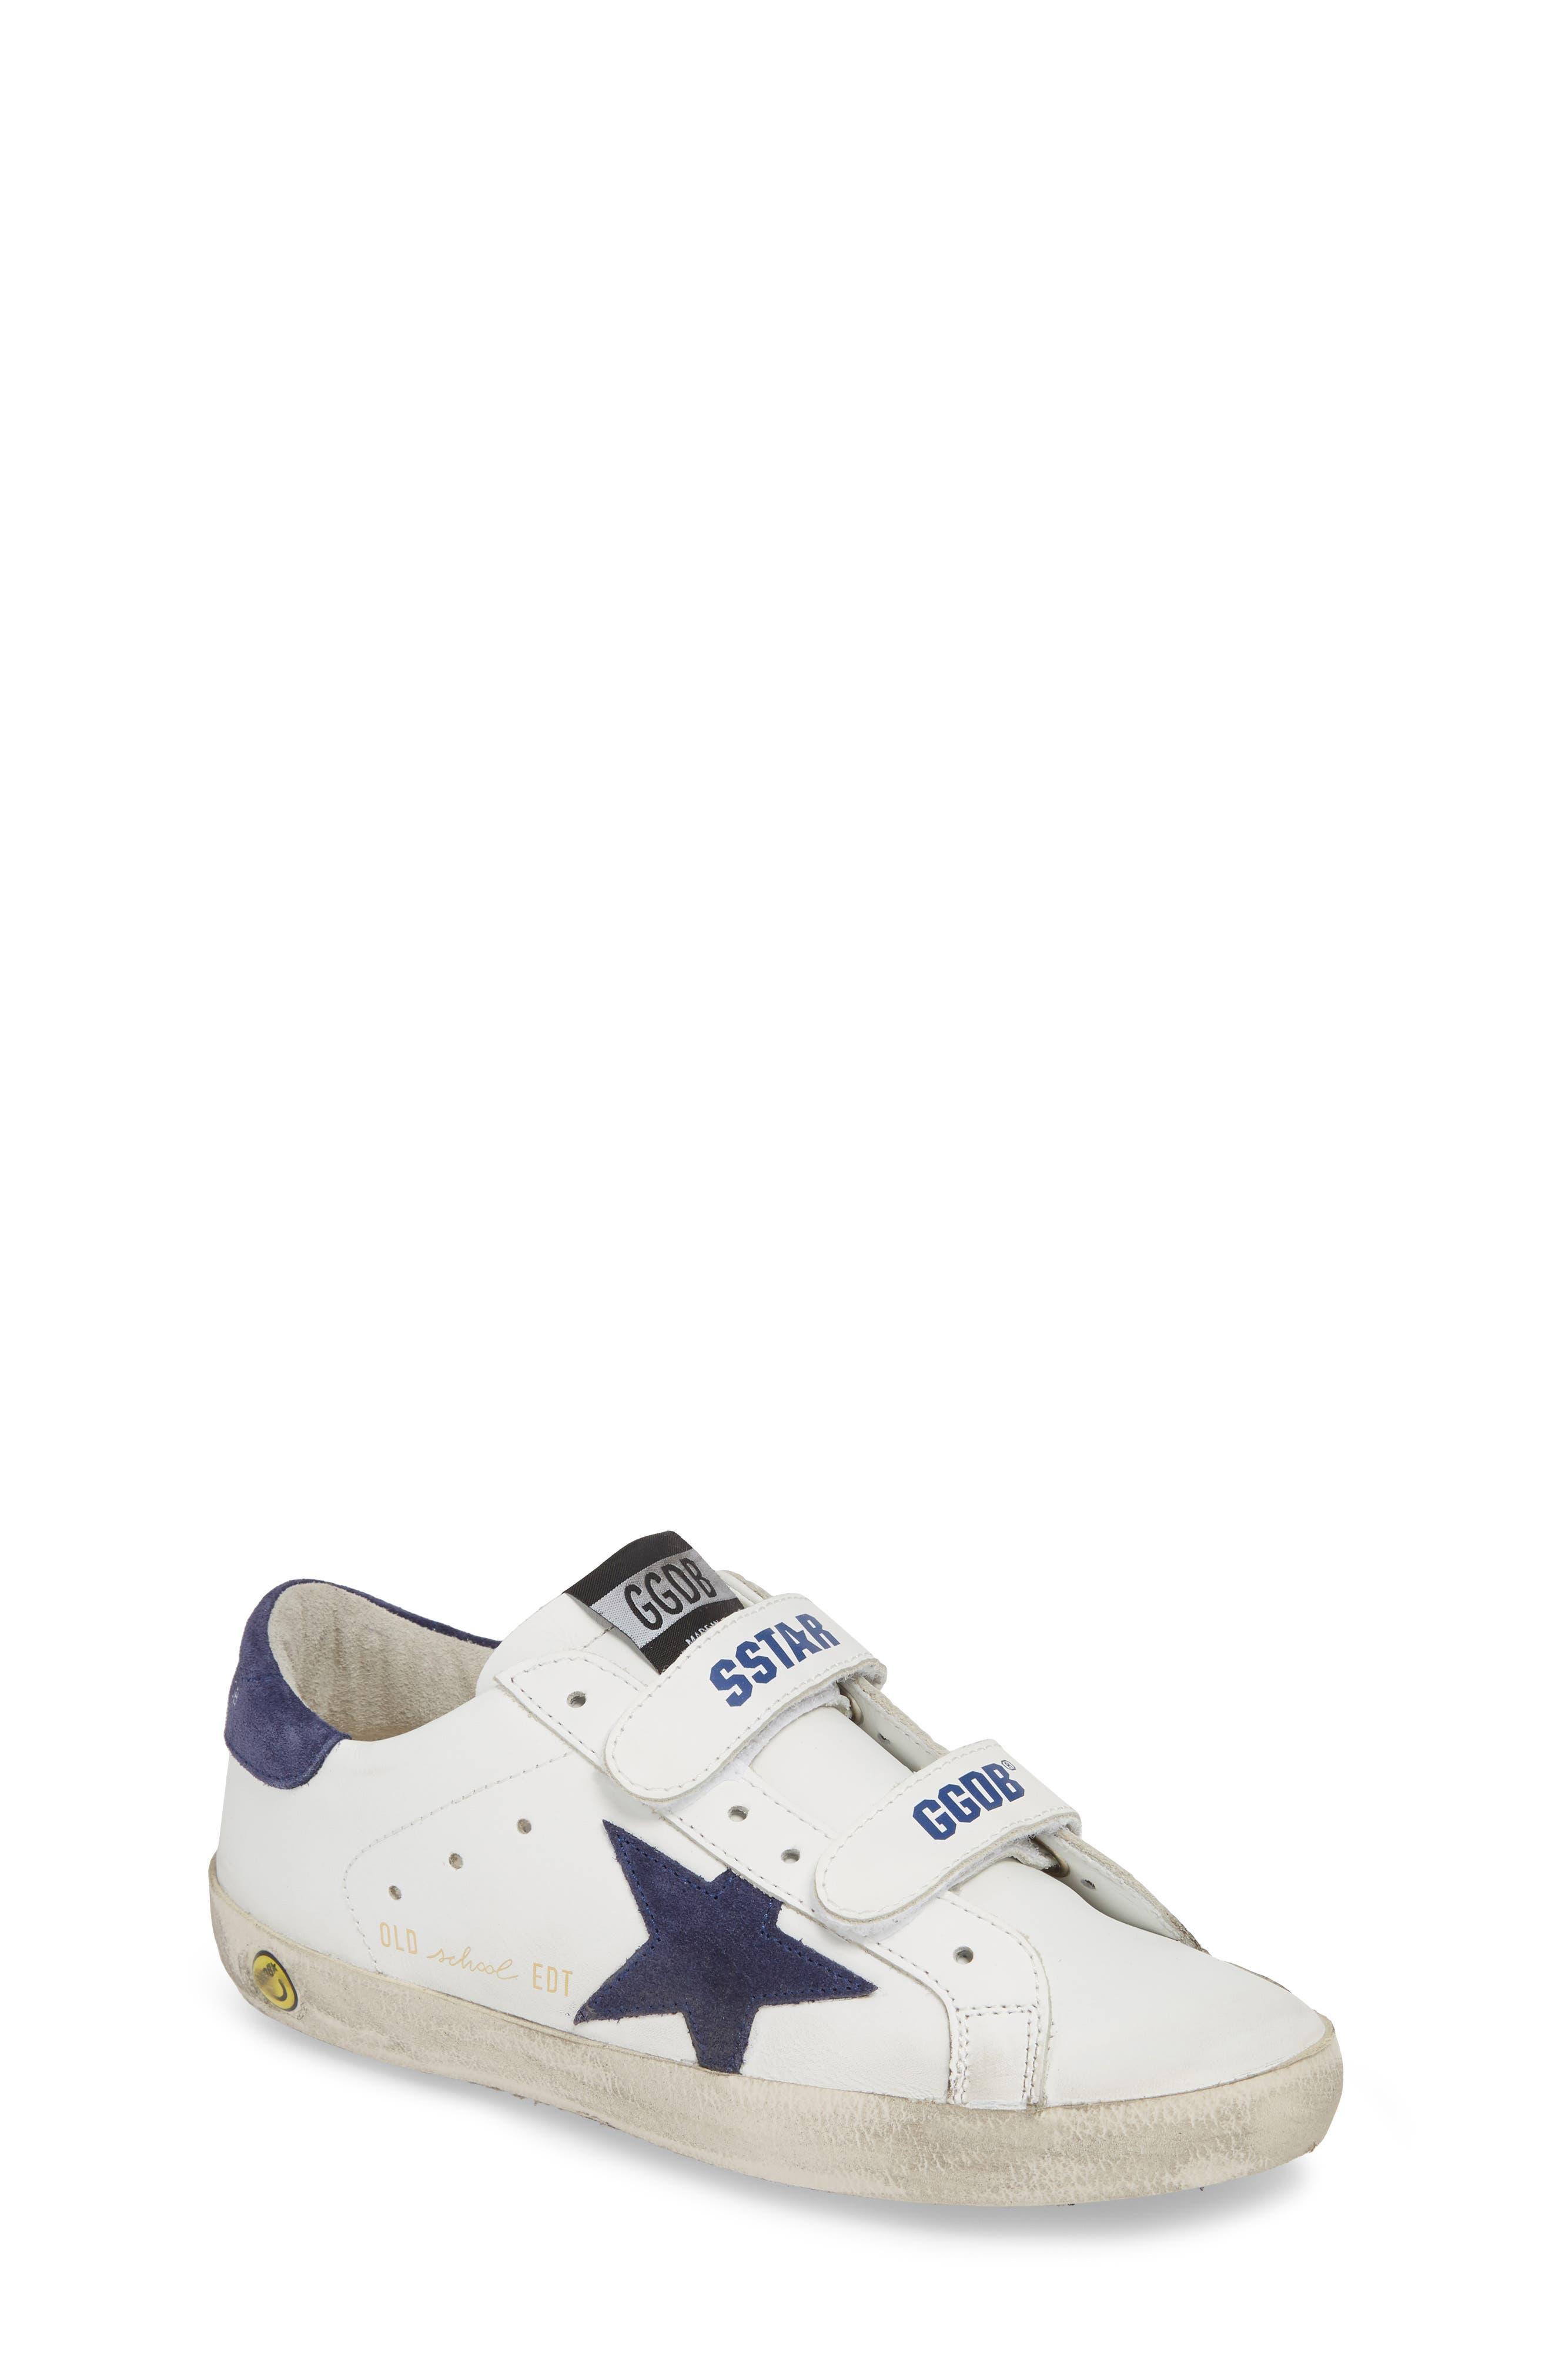 GOLDEN GOOSE,                             Glitter Old School Sneaker,                             Main thumbnail 1, color,                             WHITE LEATHER/ NAVY STAR